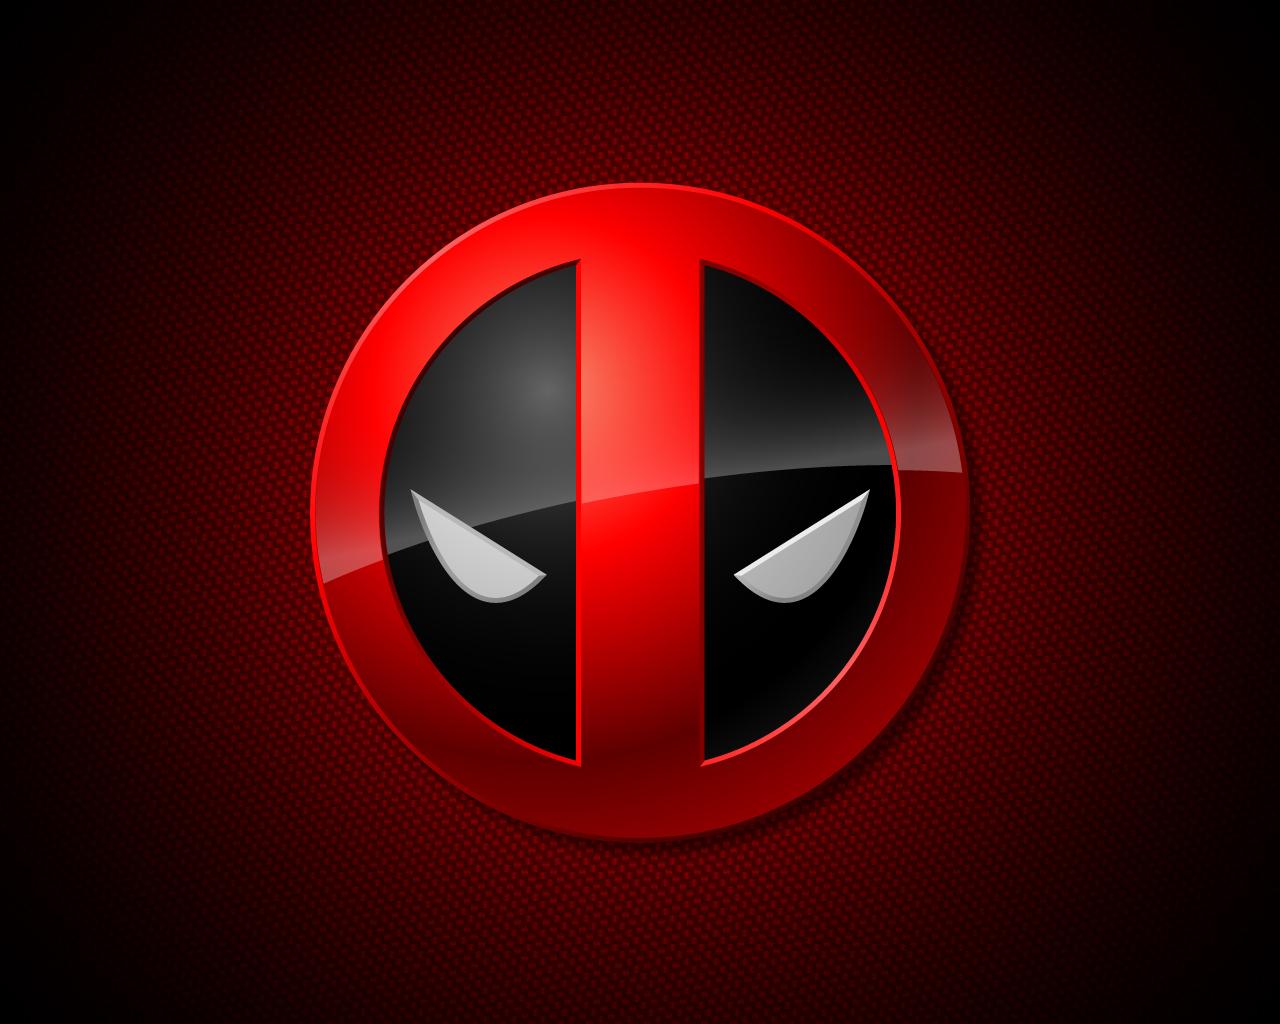 Deadpool images Deadpool Wallpaper wallpaper photos 10619272 1280x1024